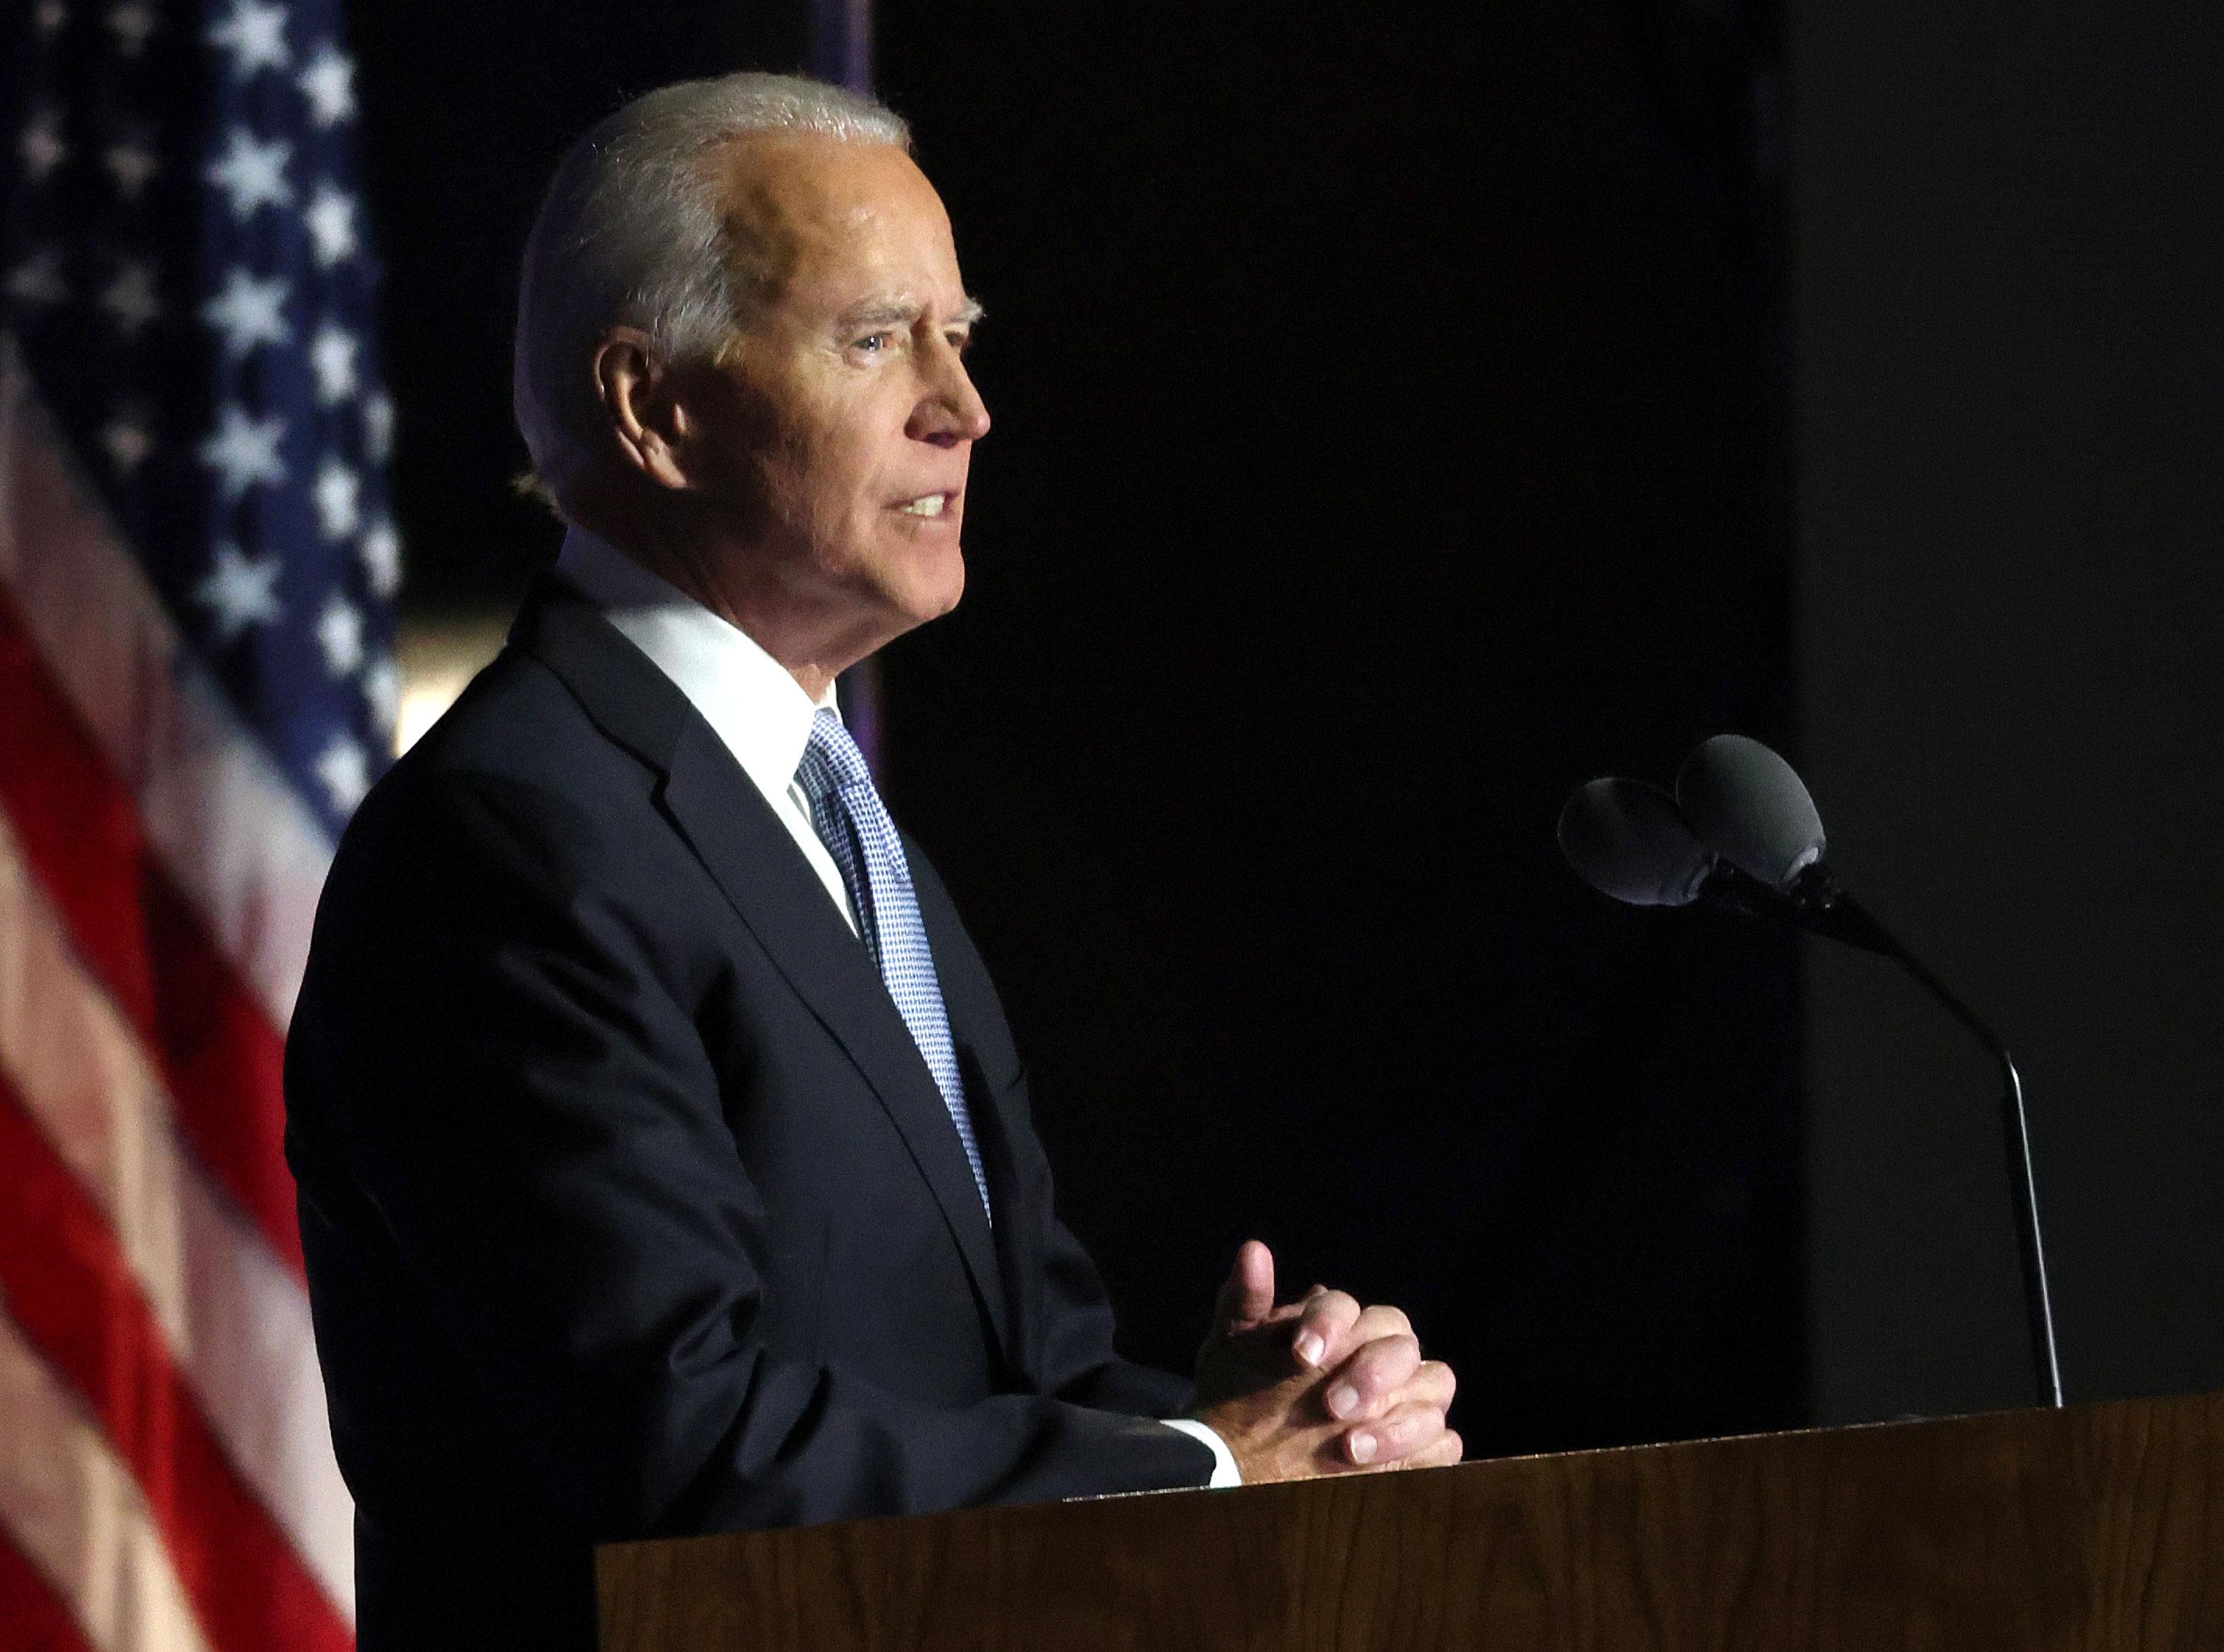 President-elect Joe Biden addresses the nation on November 7 in Wilmington, Delaware.